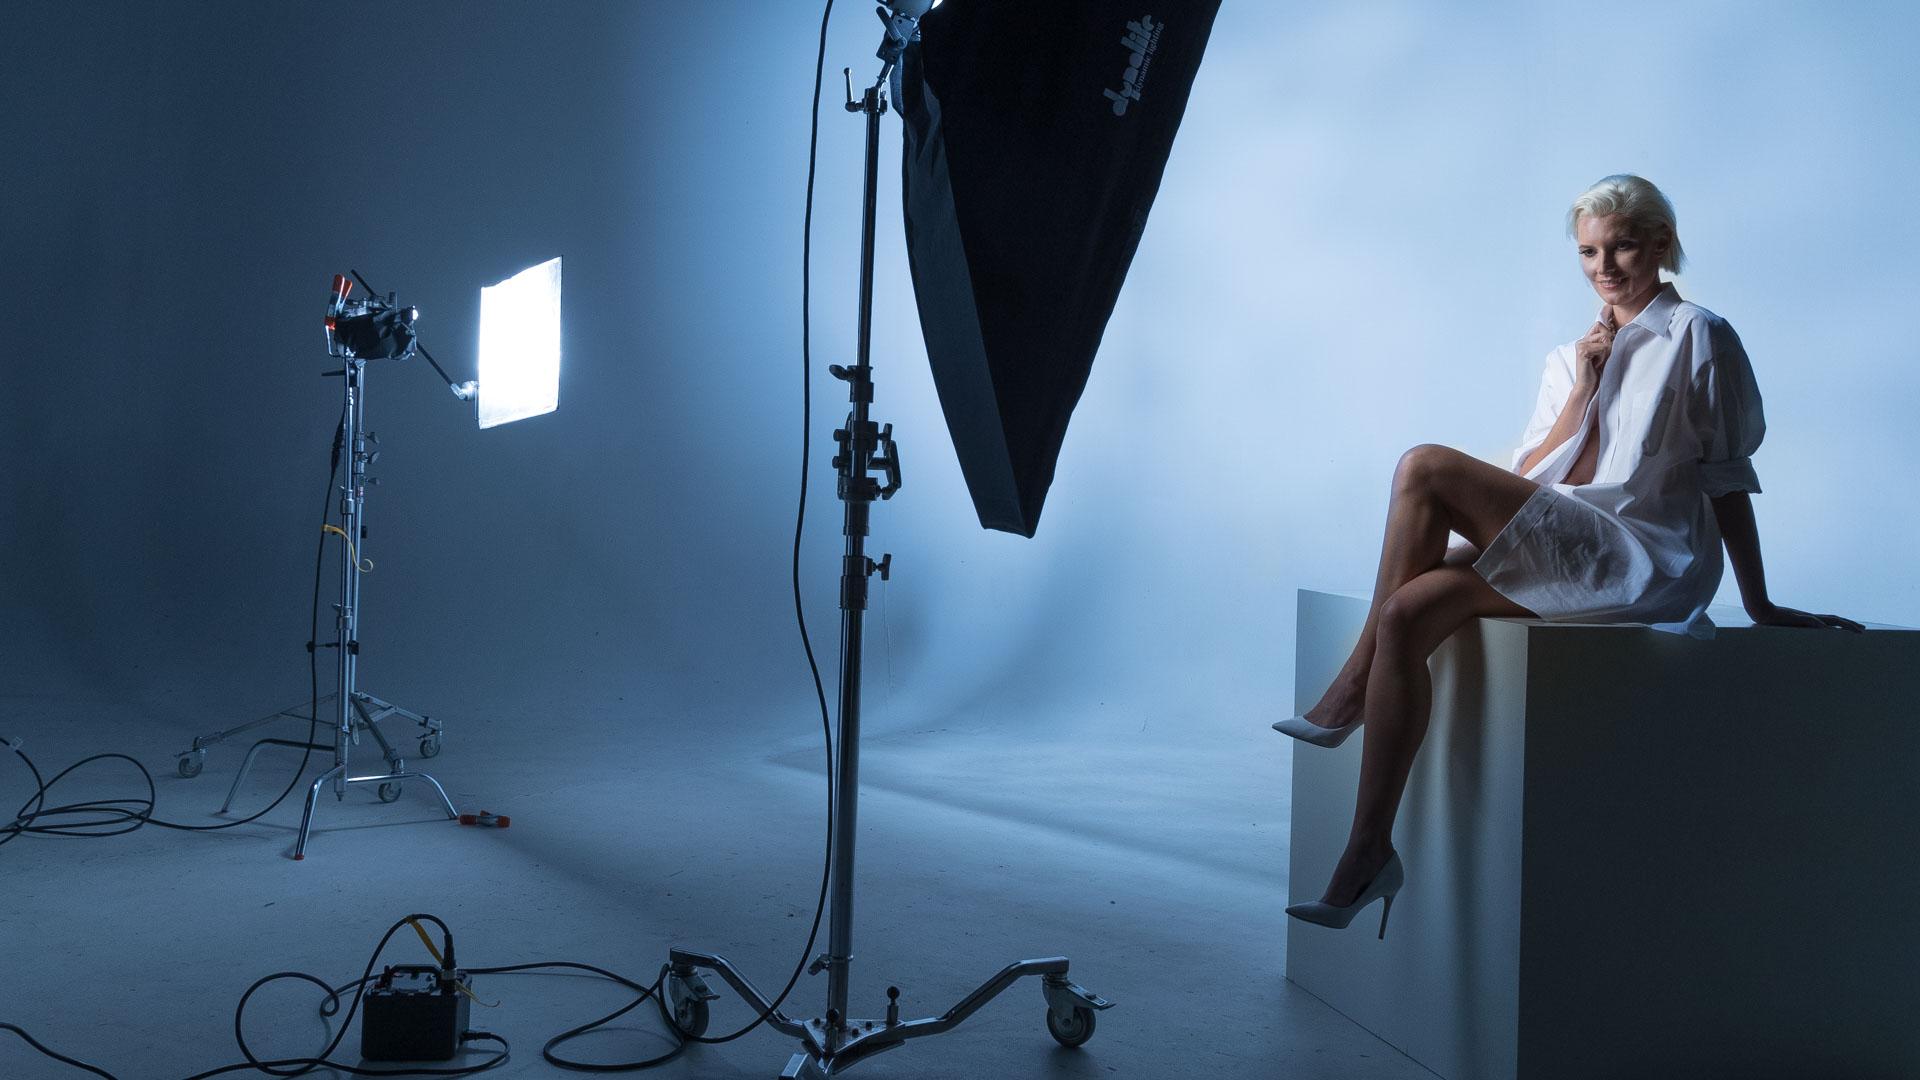 Vanessa poses at Kevin's studio